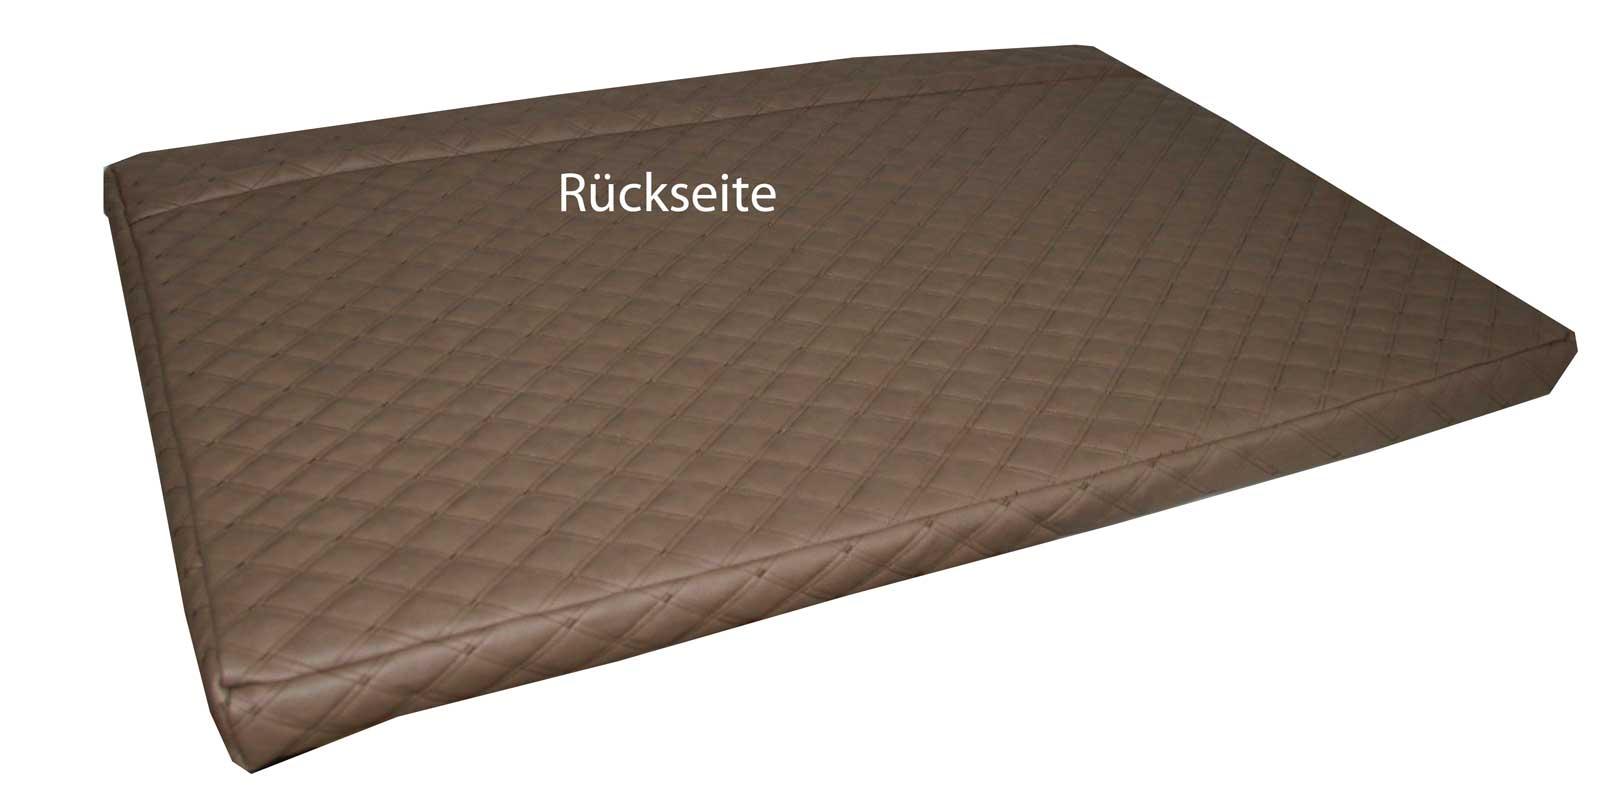 luxus palettenkissen palettenpolster palettenauflagen polsterauflagen kunstleder ebay. Black Bedroom Furniture Sets. Home Design Ideas